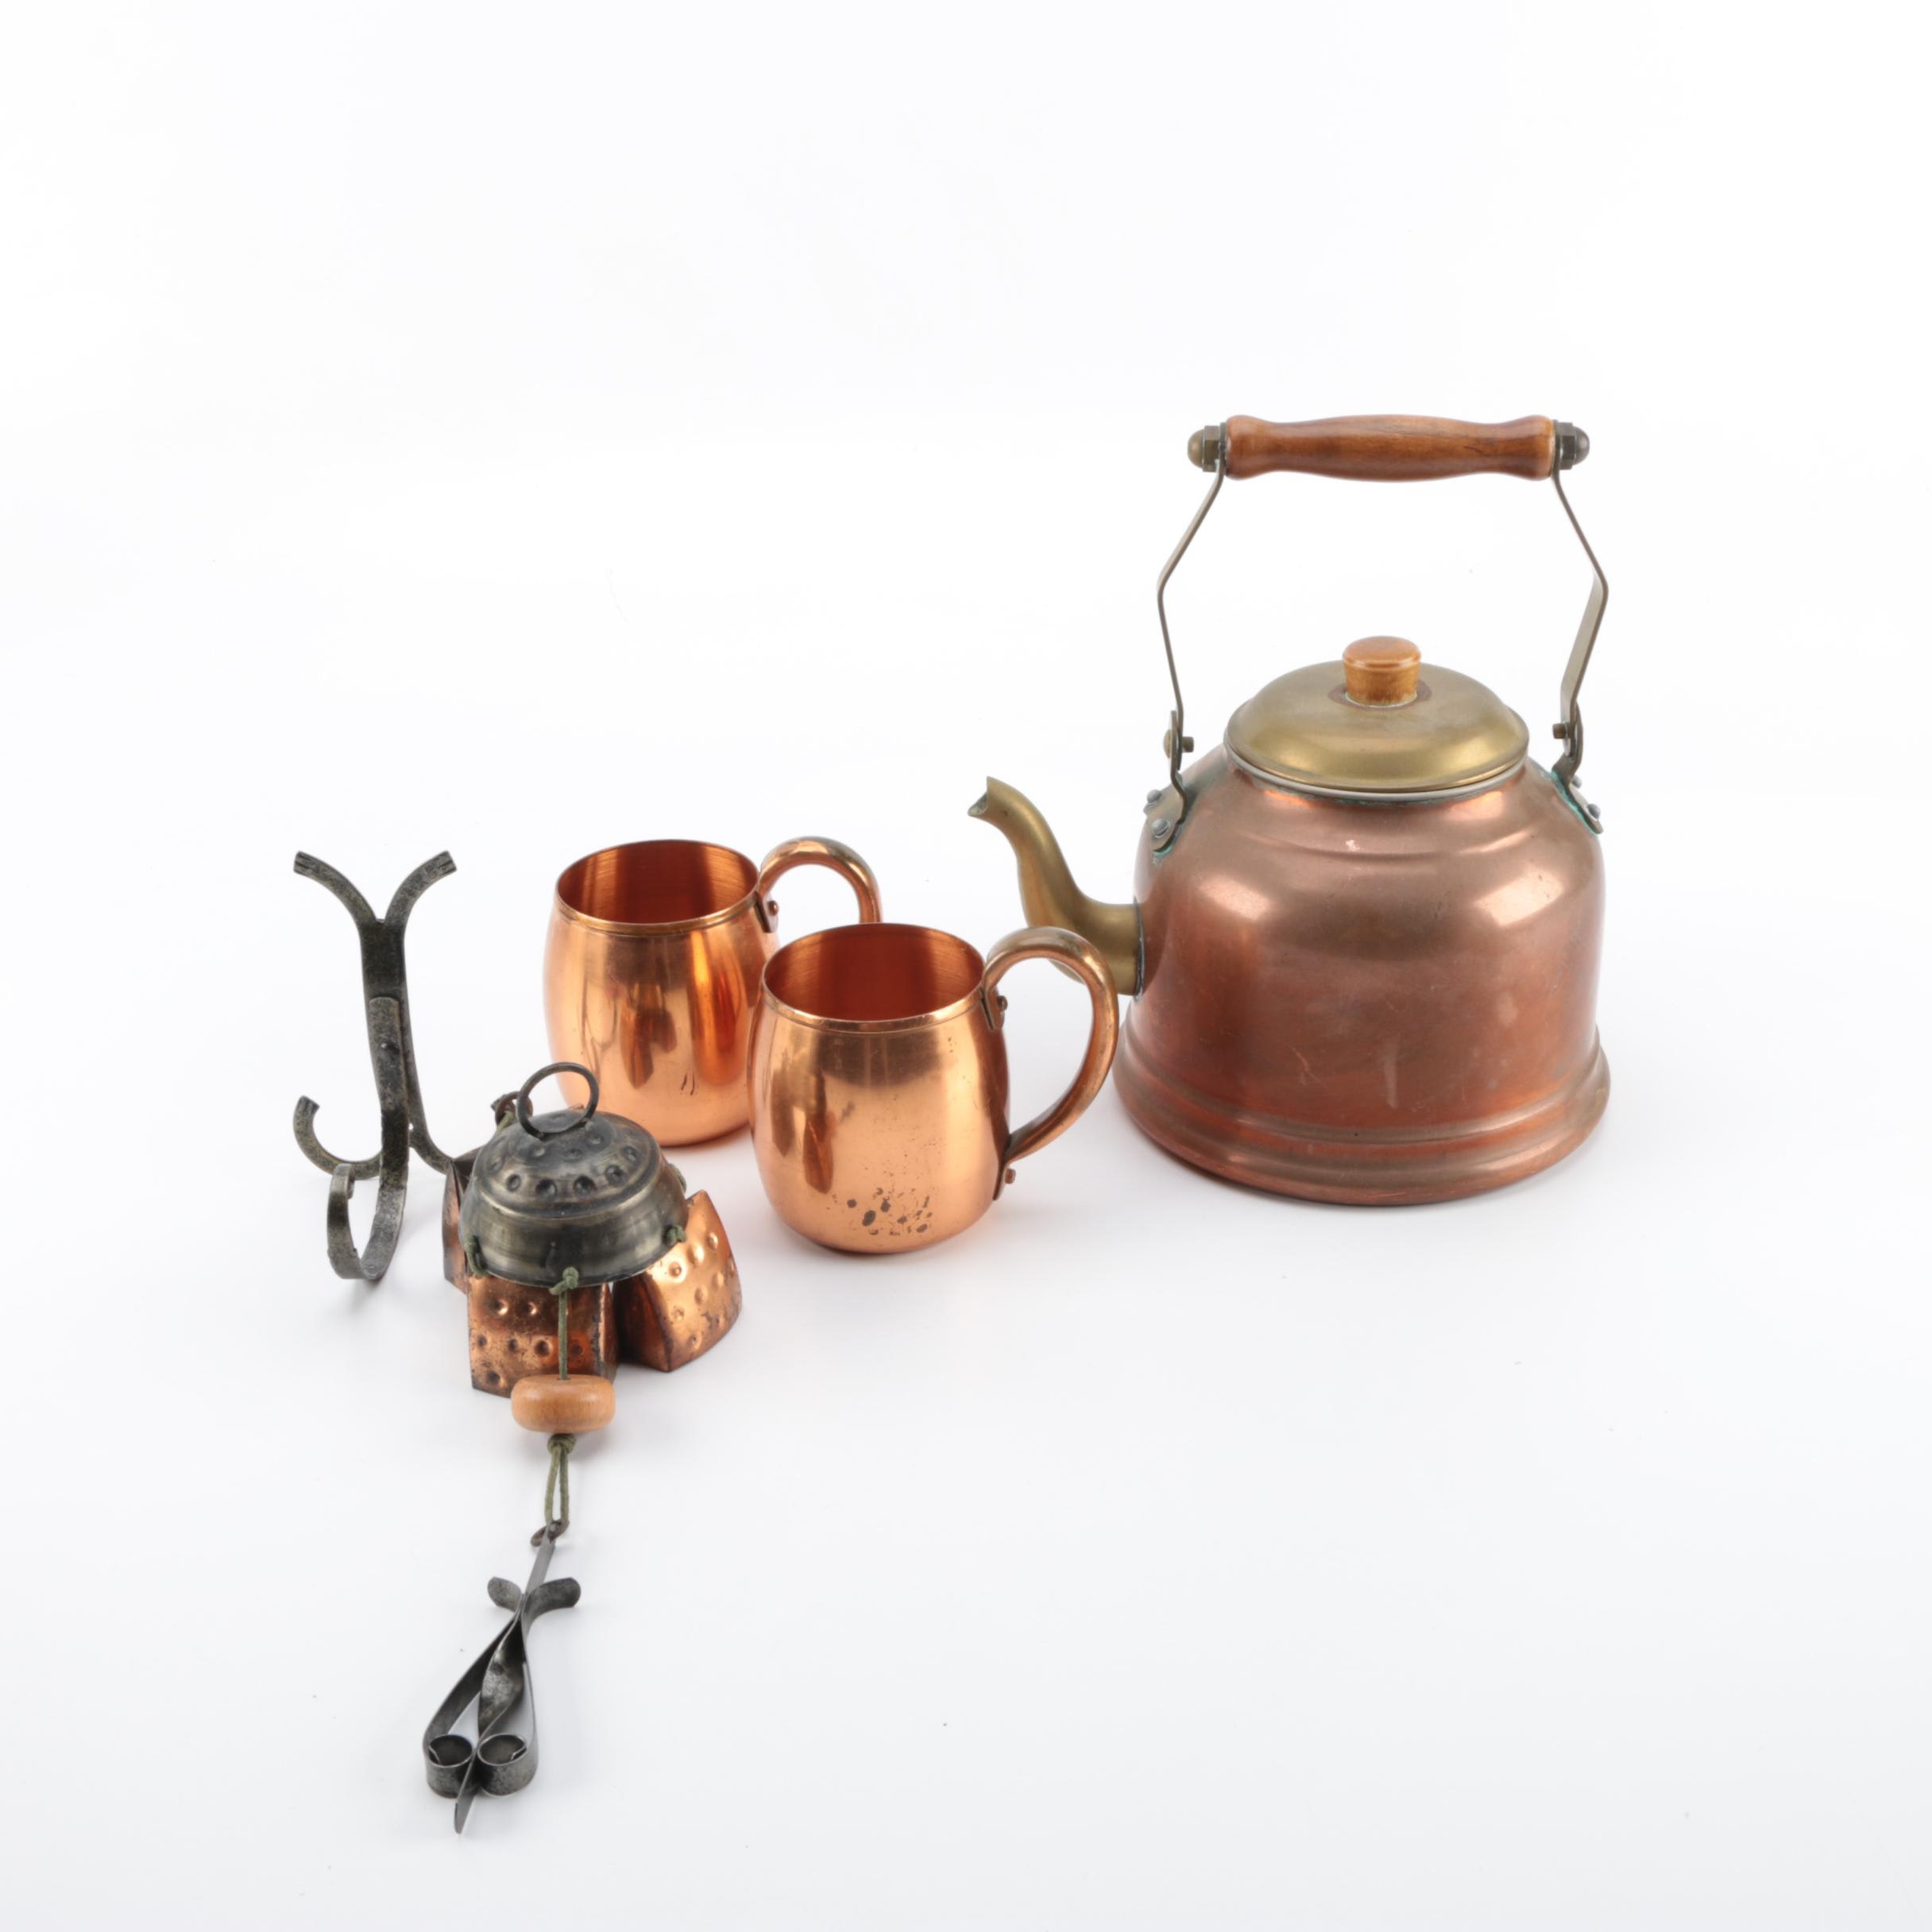 Selection of Vintage Copper Kitchen Utensils